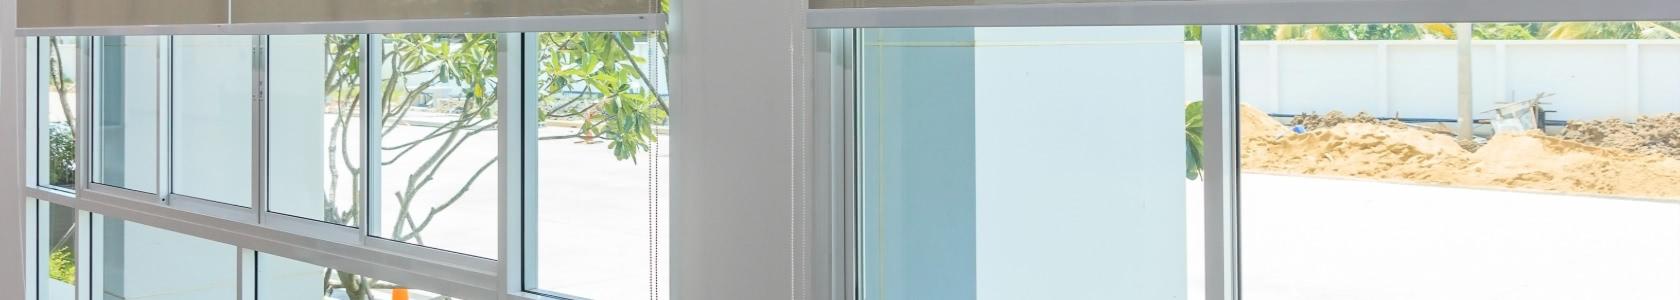 windows in a home